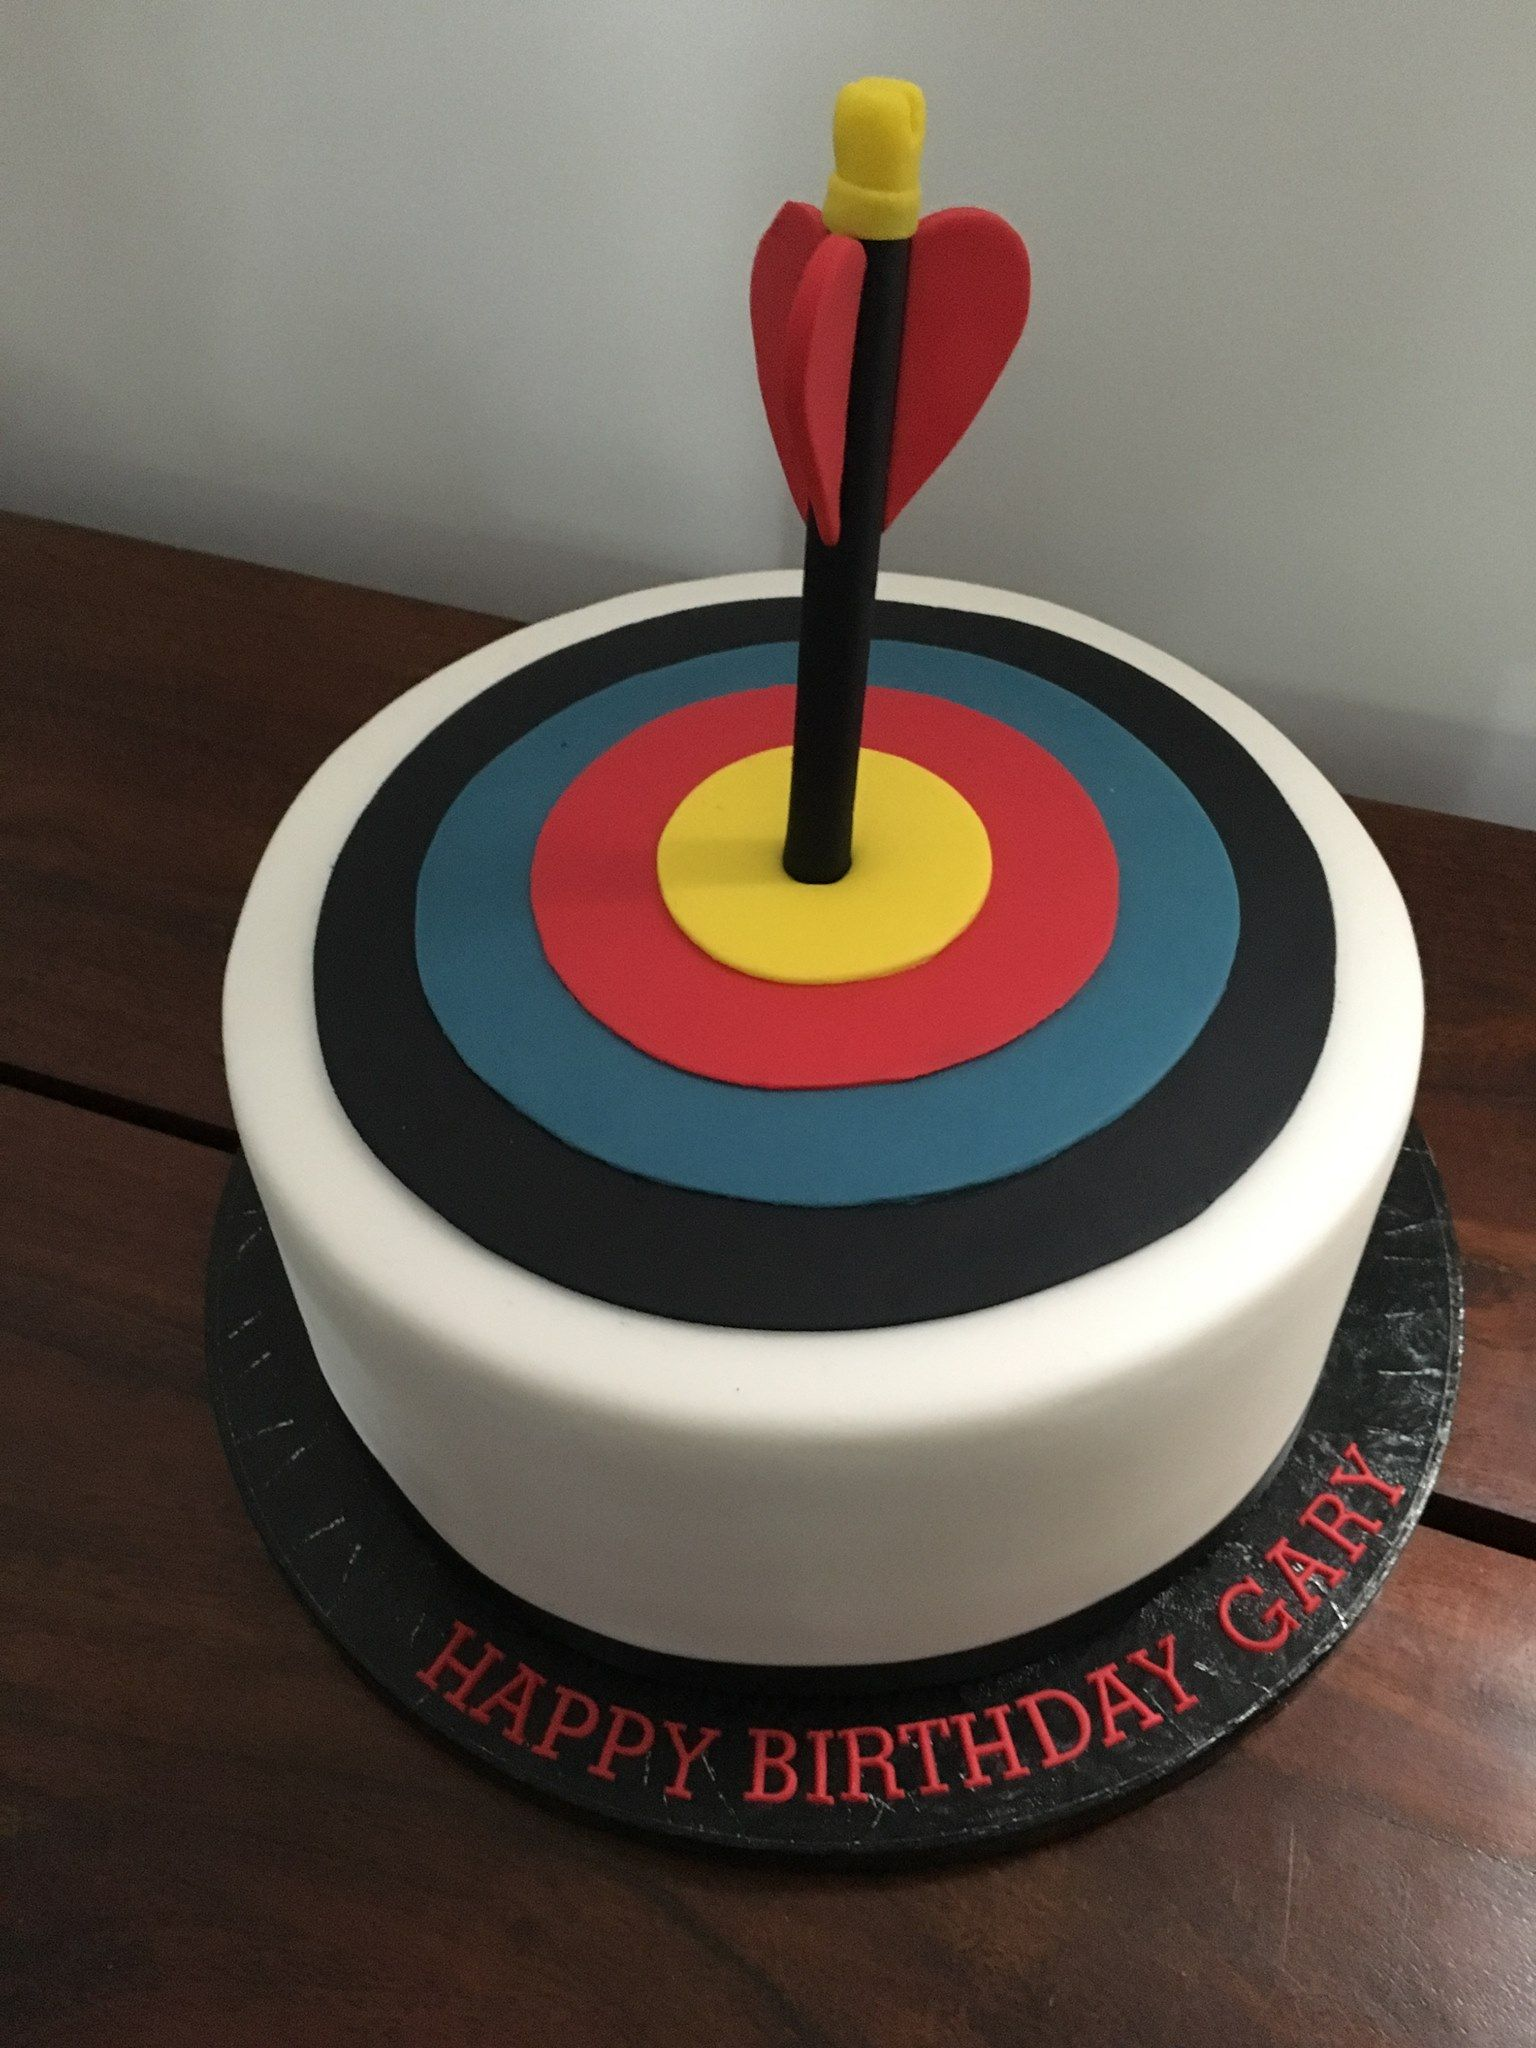 Archery target cake fondant cakes birthday cake